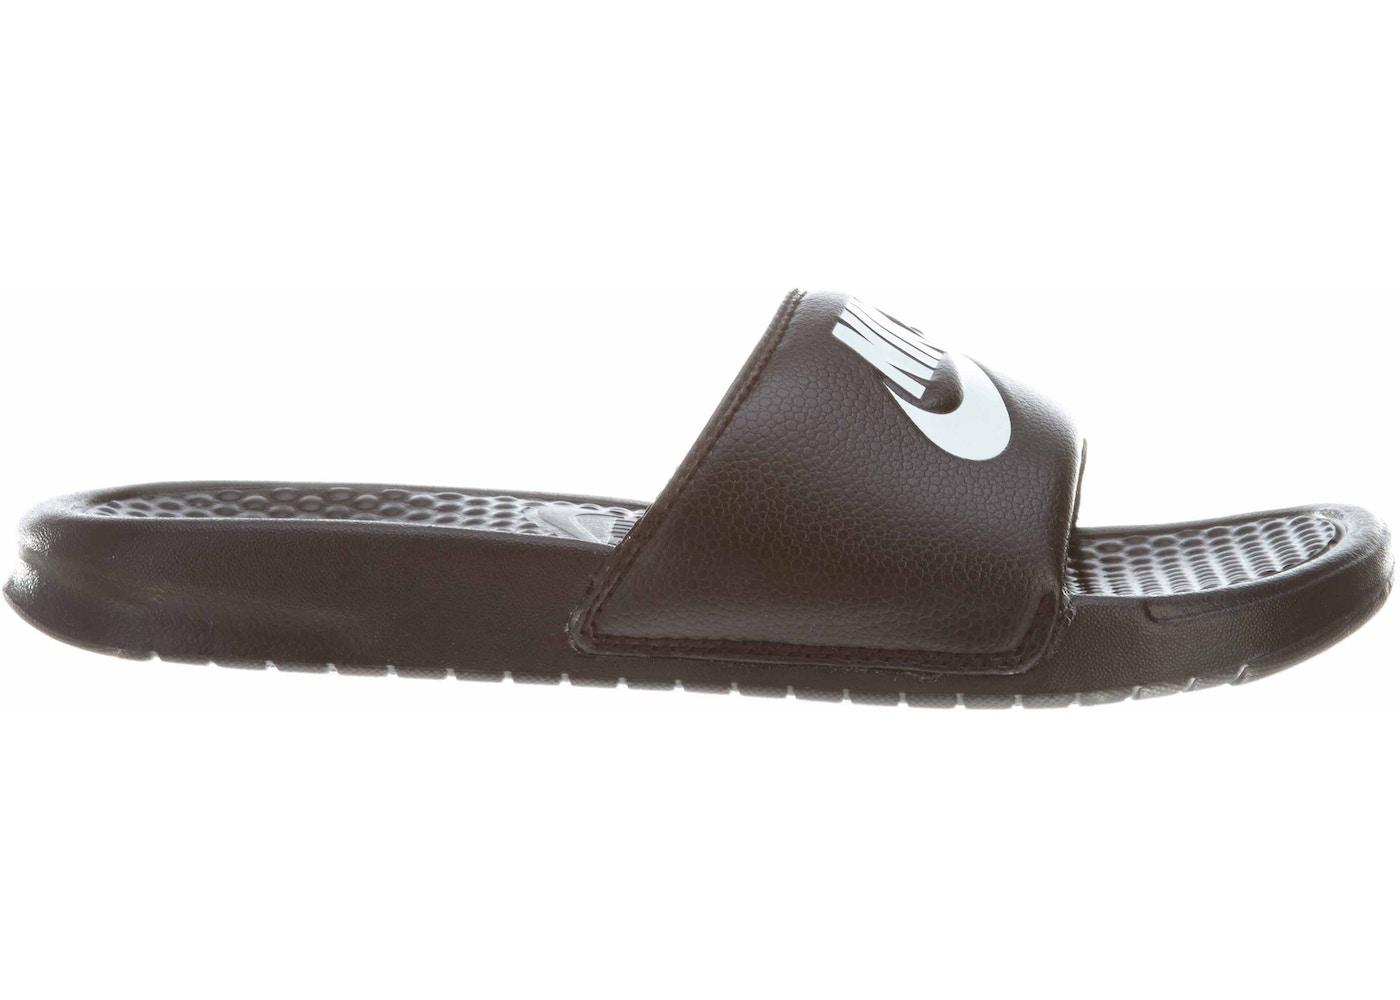 75fab36fe469 Nike Benassi Jdi Black White - 343880-090